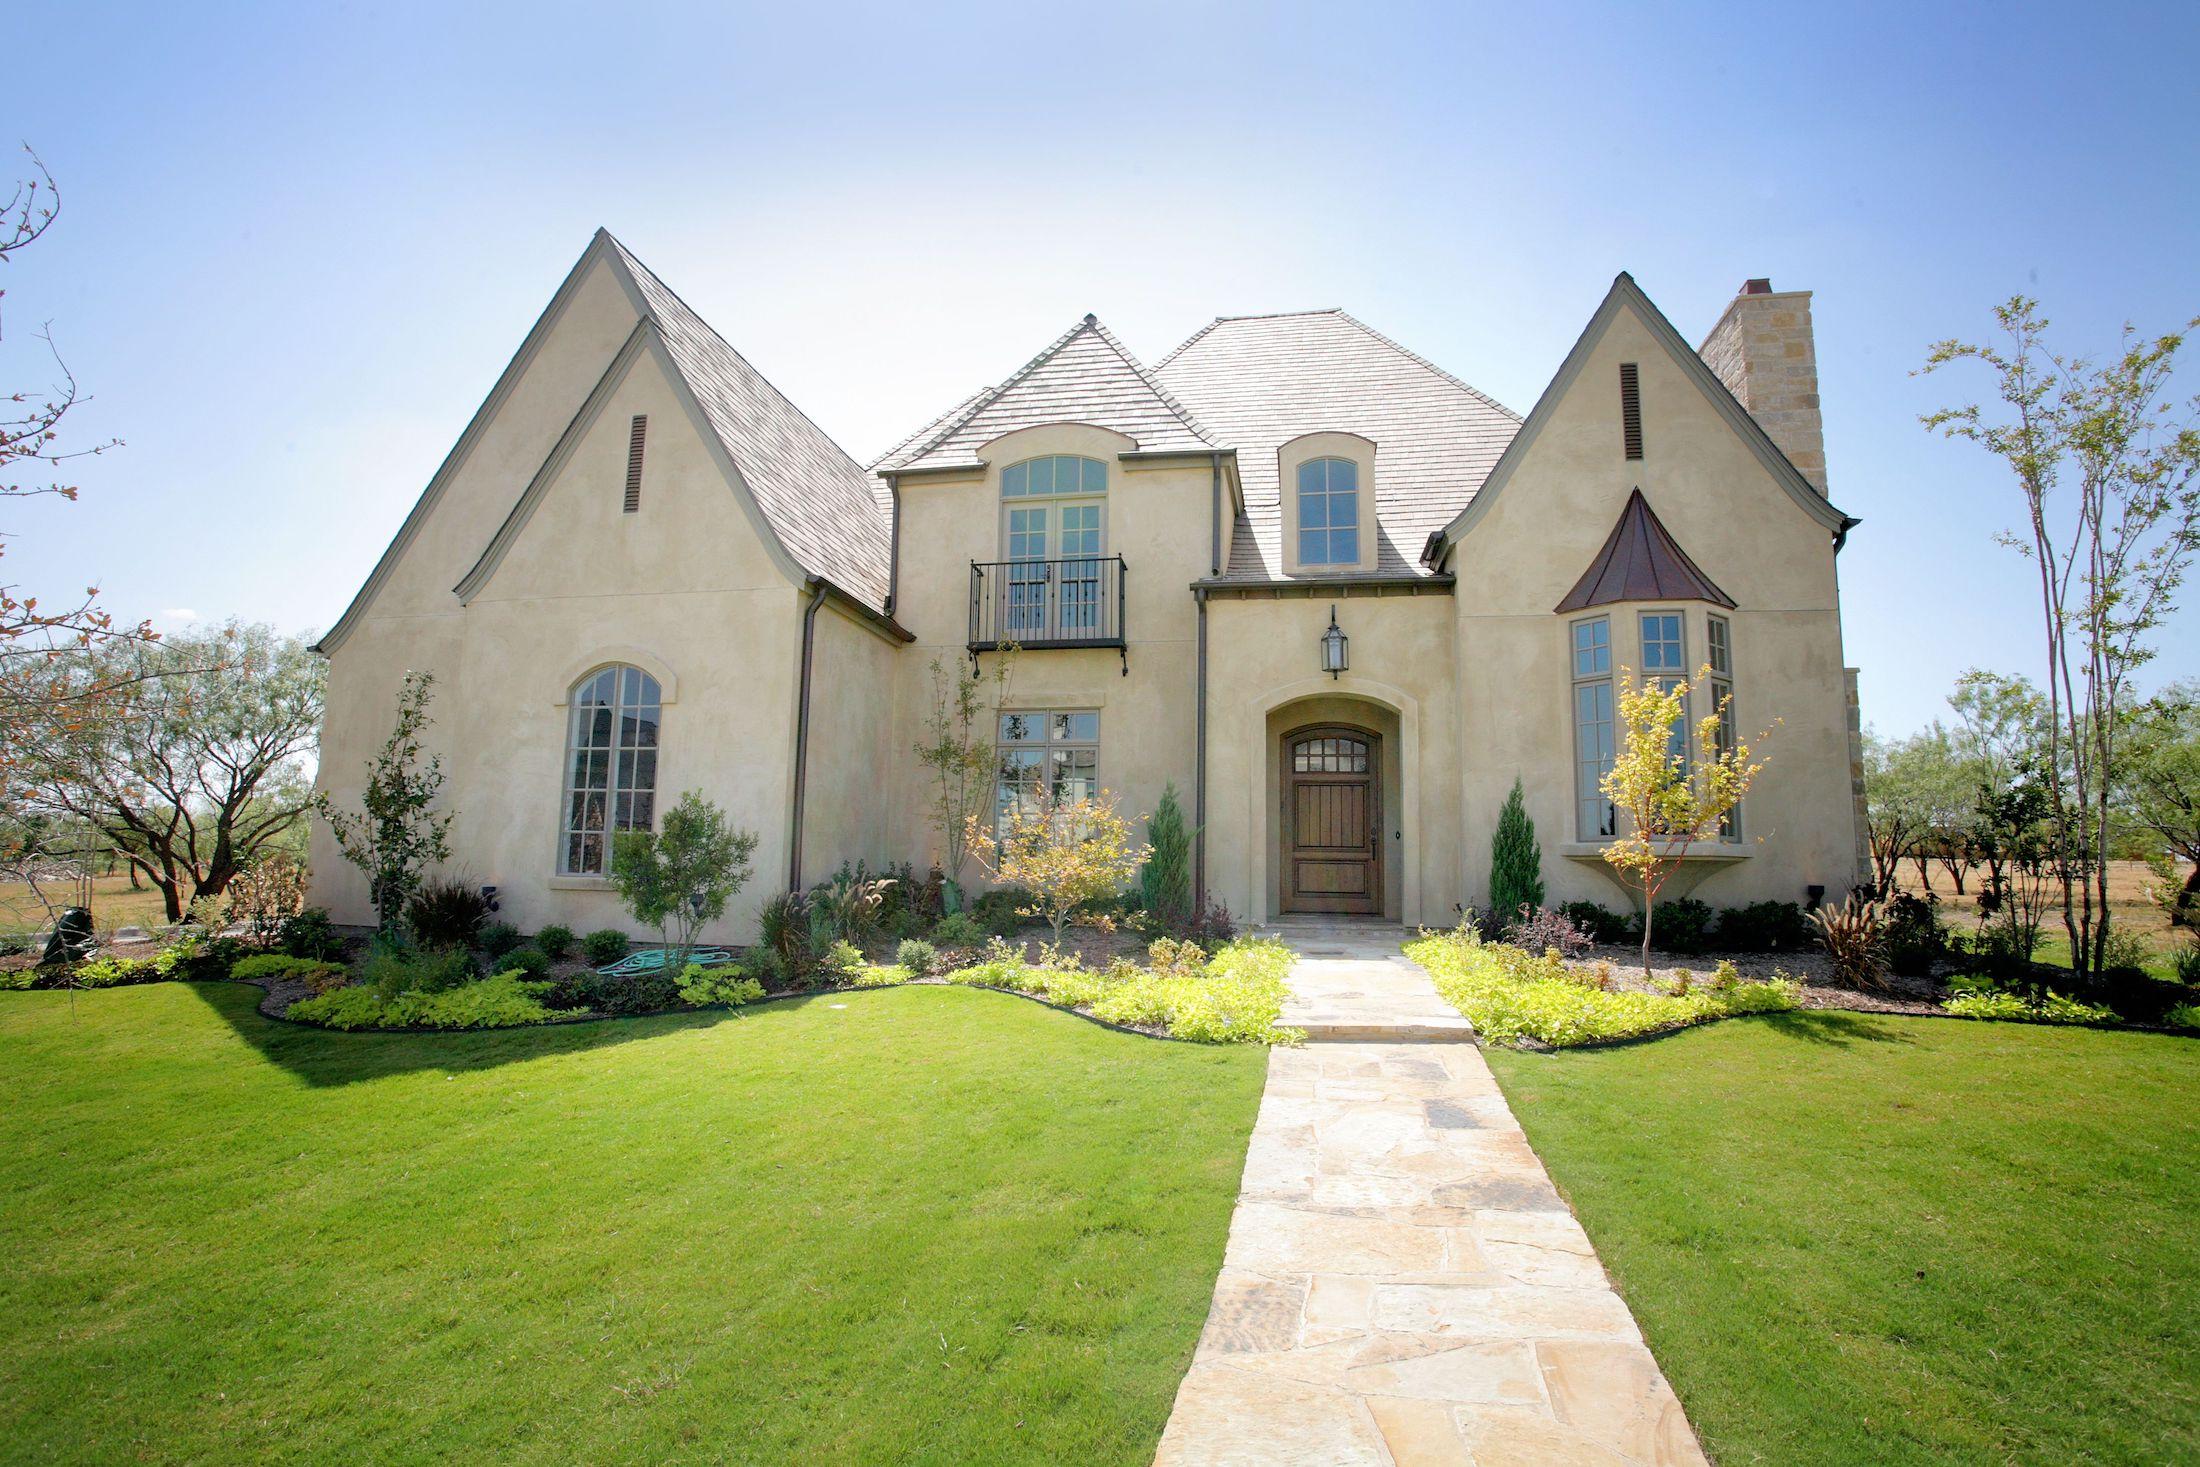 Exterior Home Design (North Texas): Stucco French Norman Home